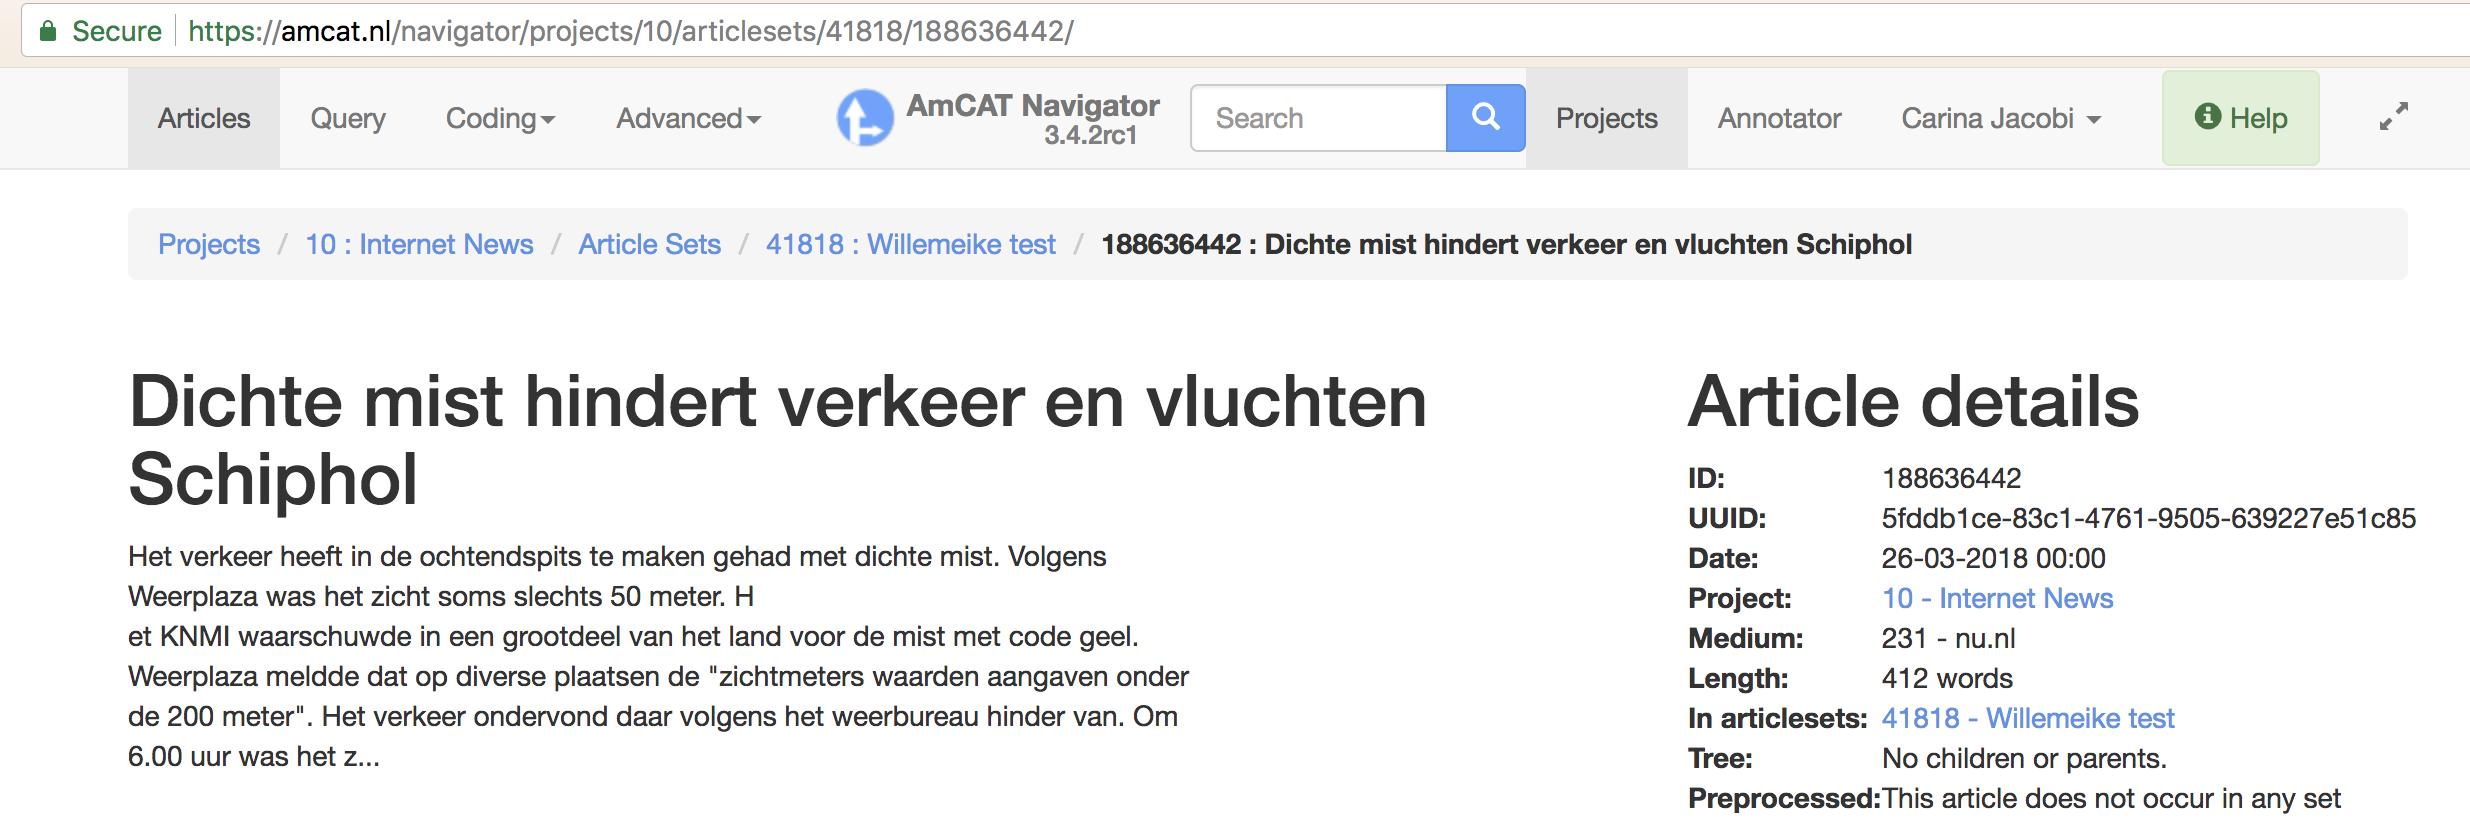 Lexis Nexis uploader ignores URL for online media · Issue